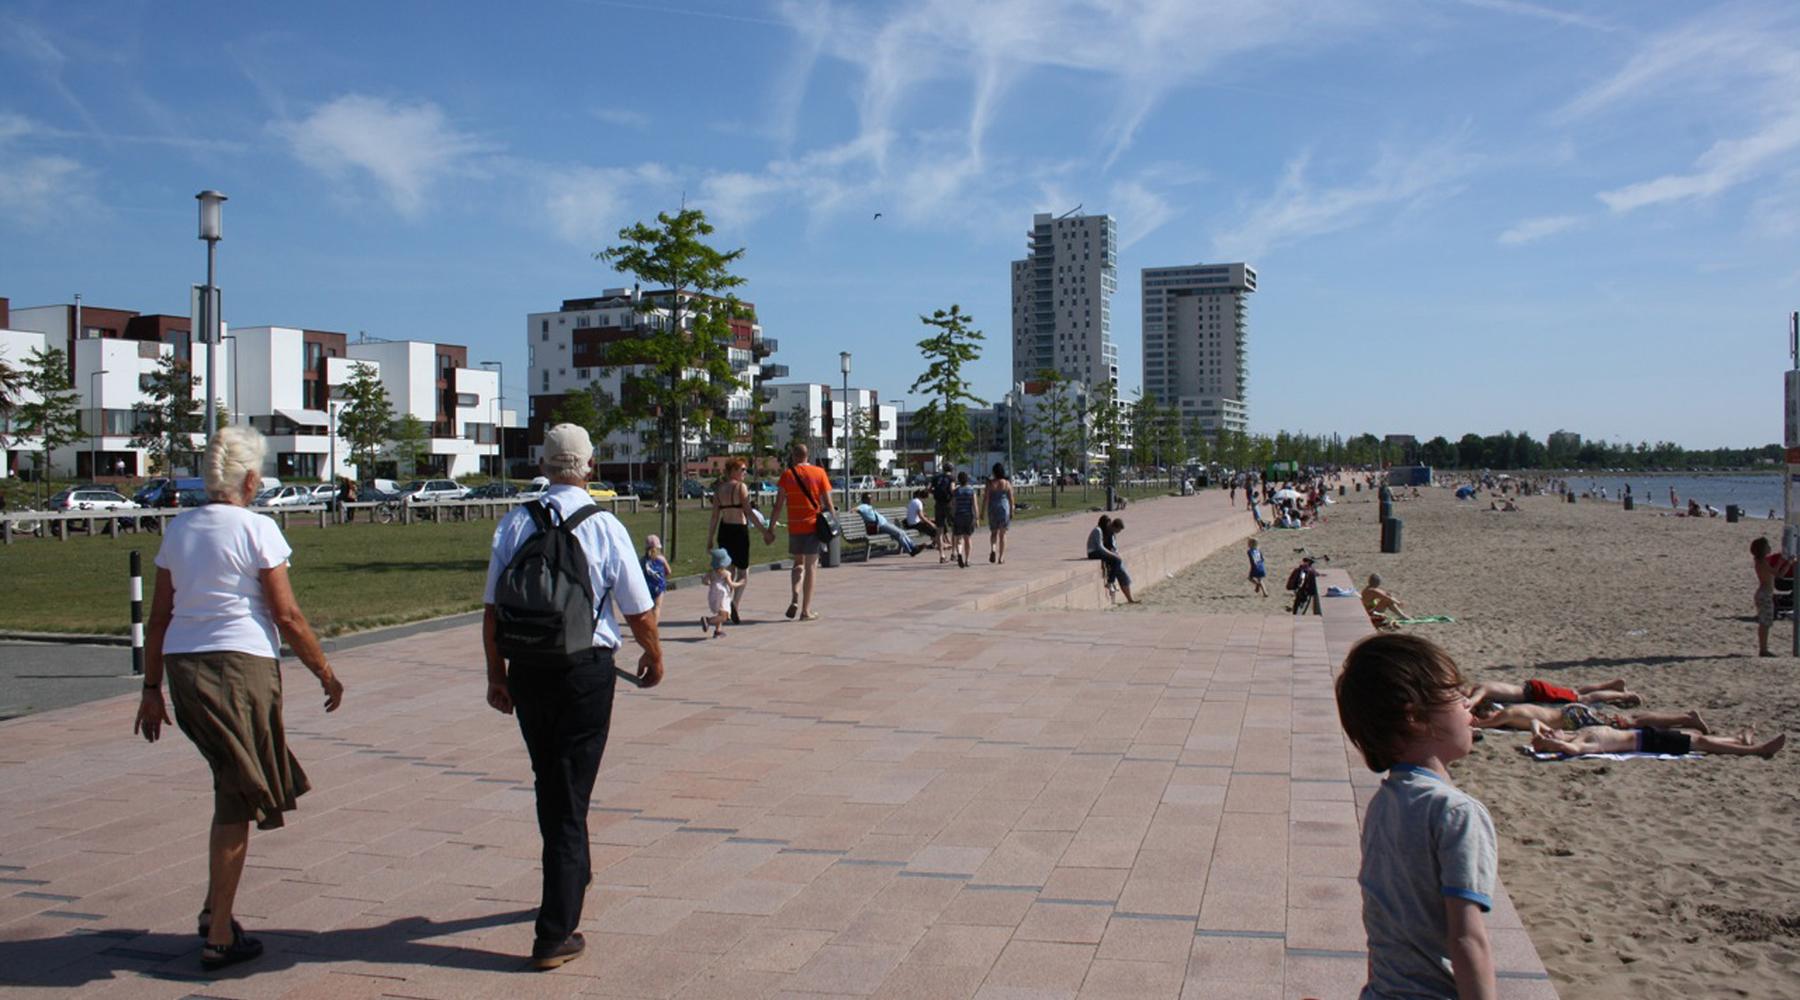 morfis-urbanism-nesselande-07